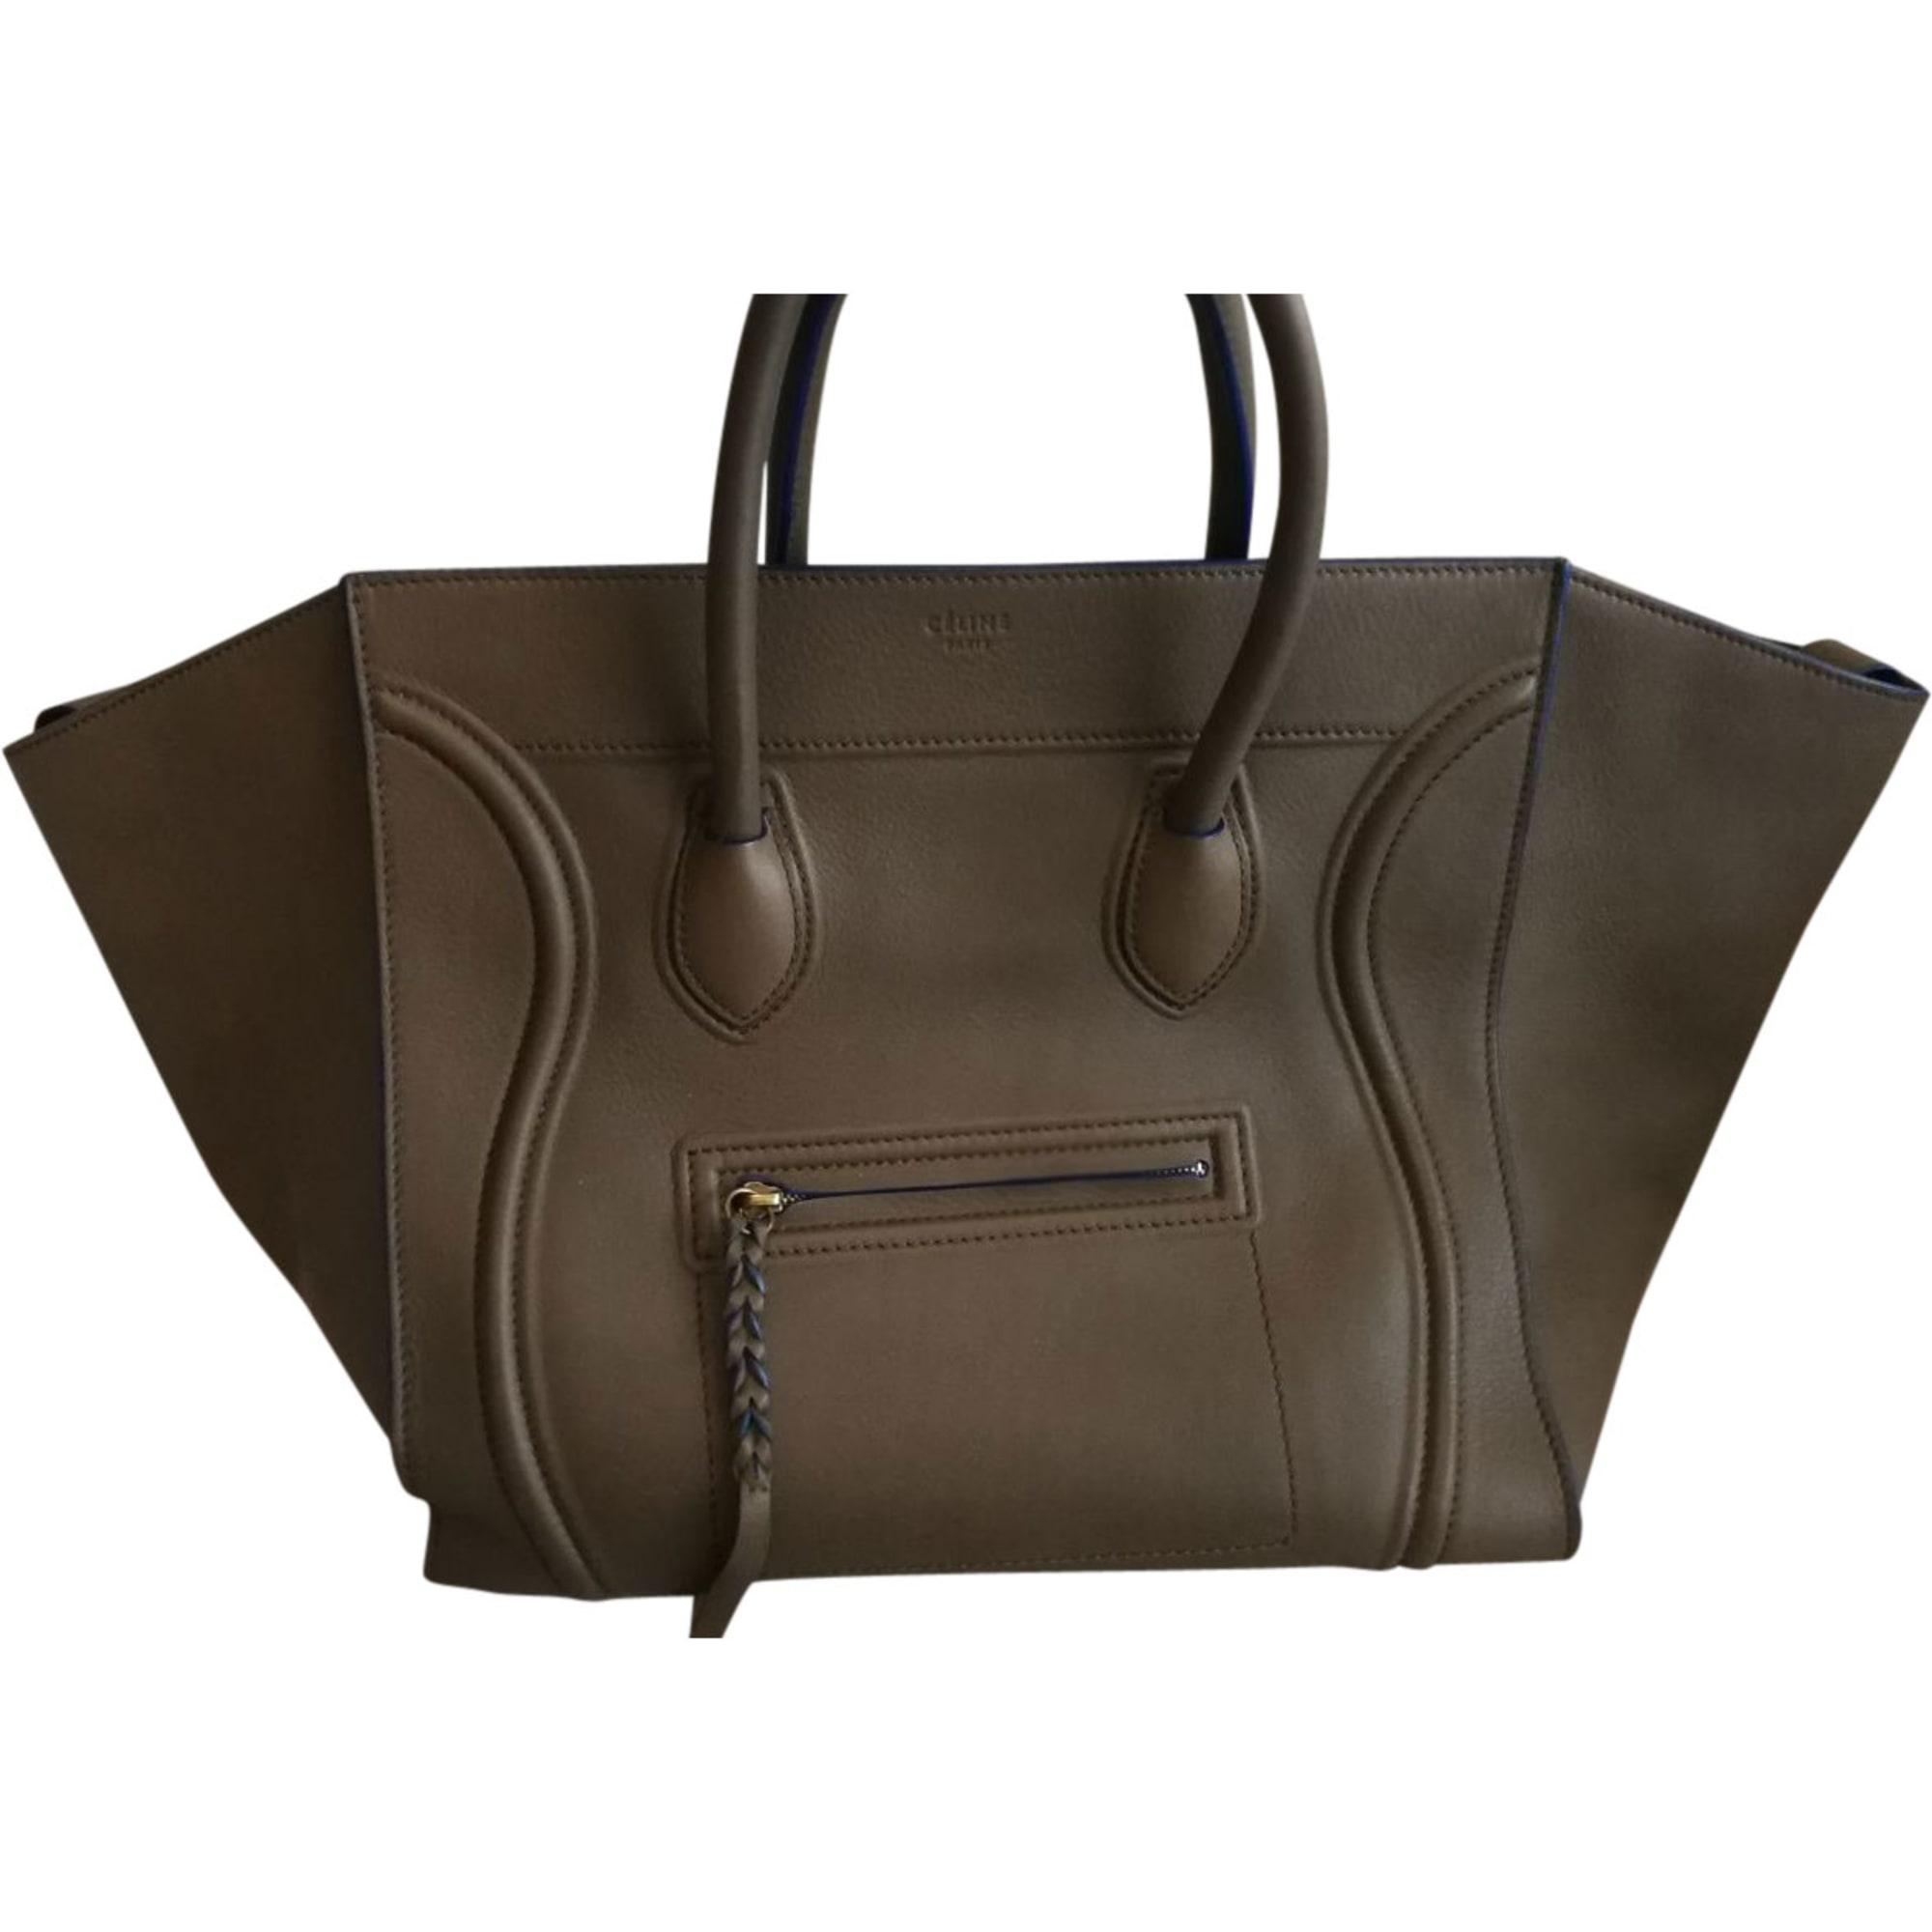 8030918 Khaki Céline Phantom Handbag Leather a5I5YxqwZ